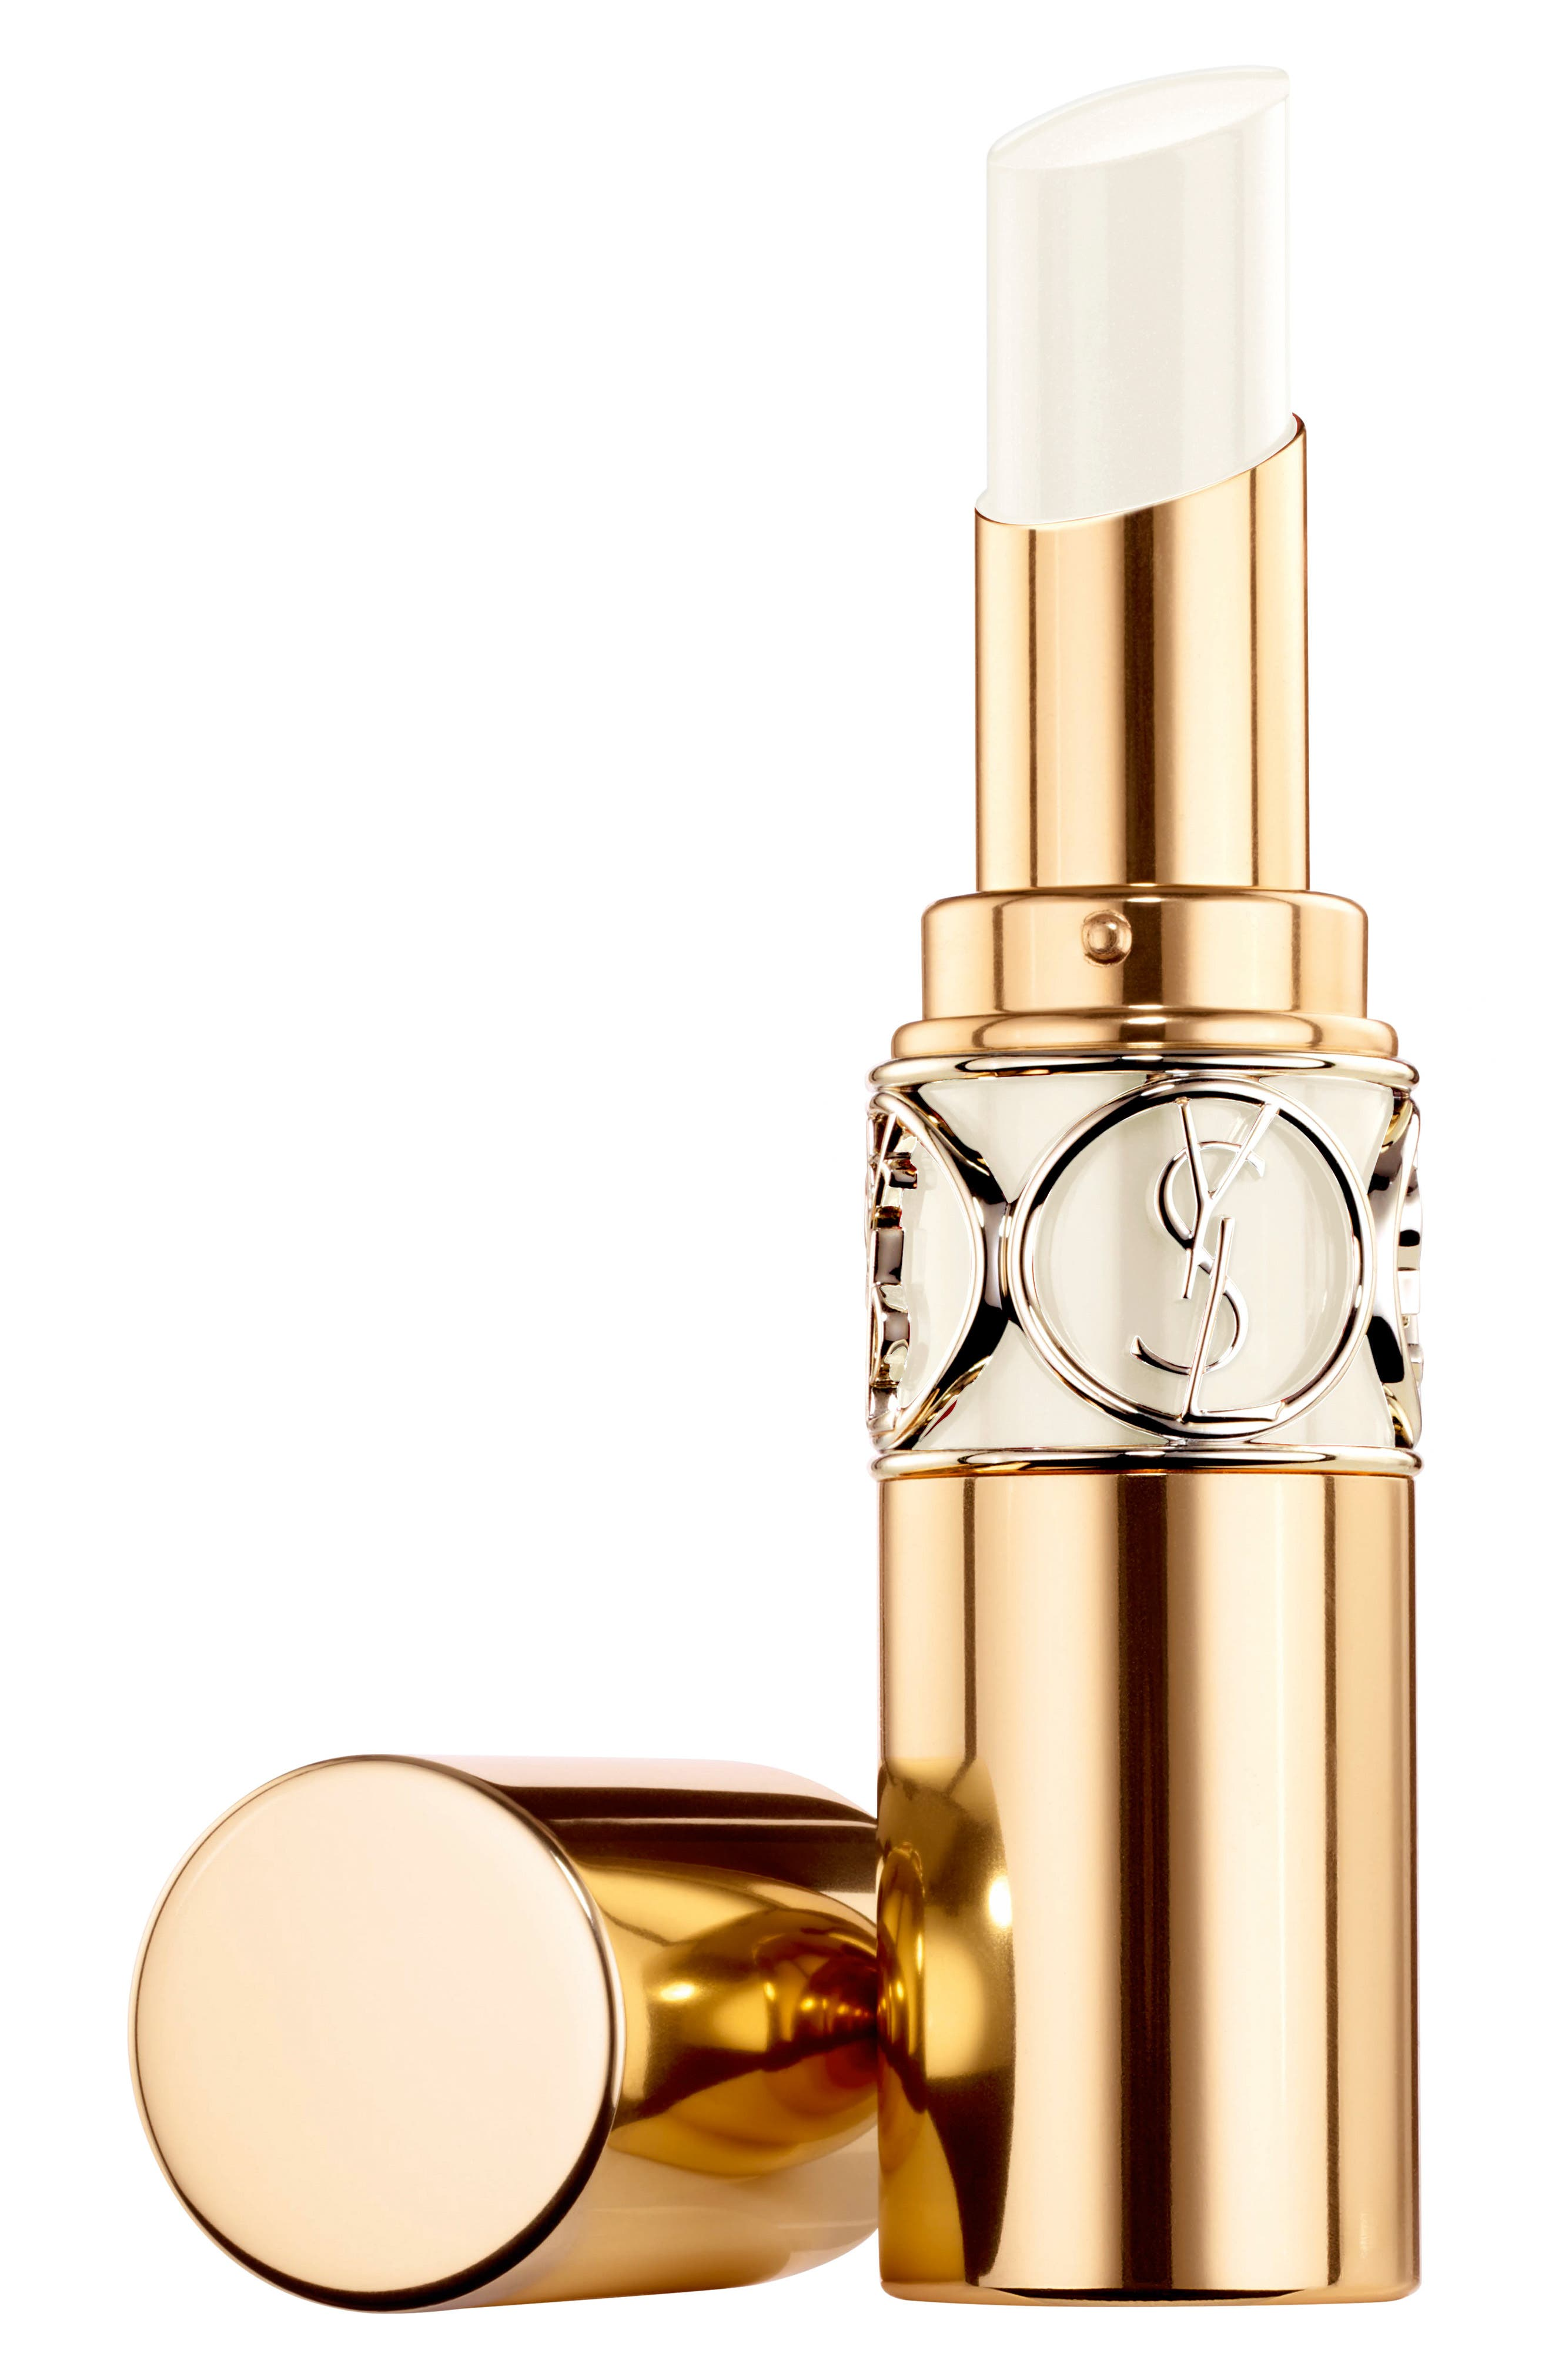 Yves Saint Laurent Rouge Volupte Shine Oil-In-Stick Lipstick - 42 Baume Midi Minuit